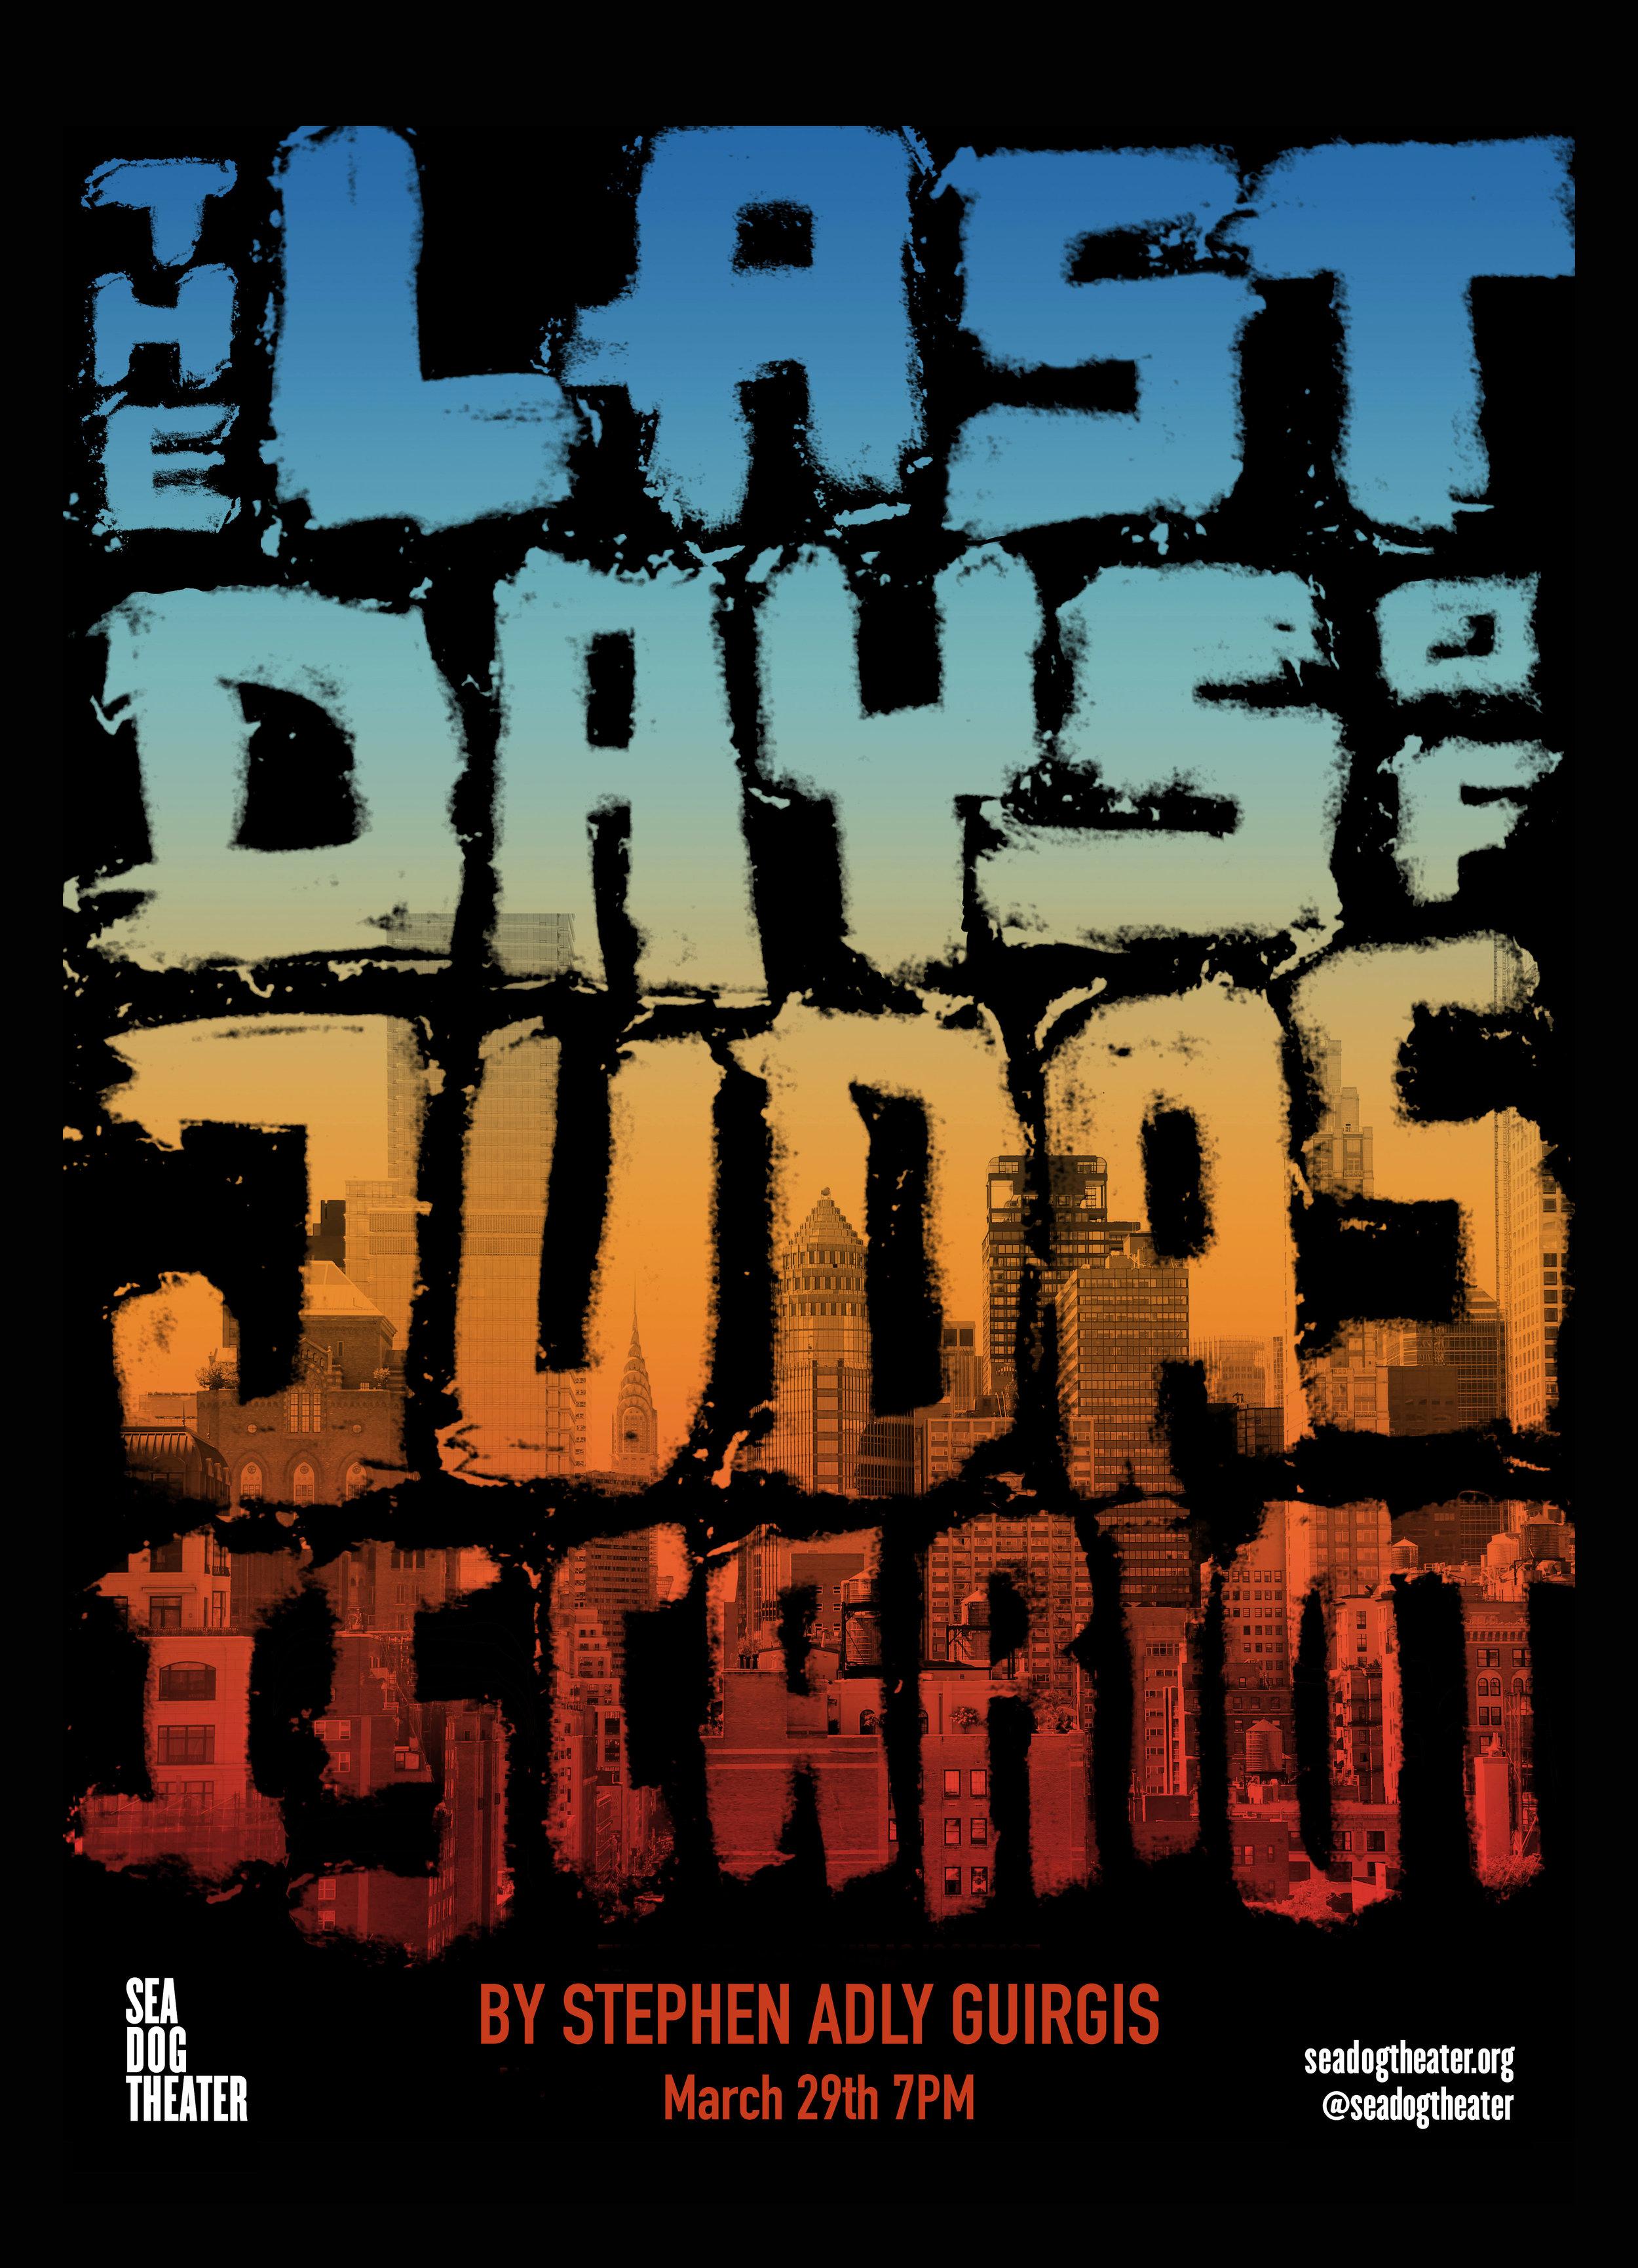 Last Days of Judas Iscariot LG.jpg